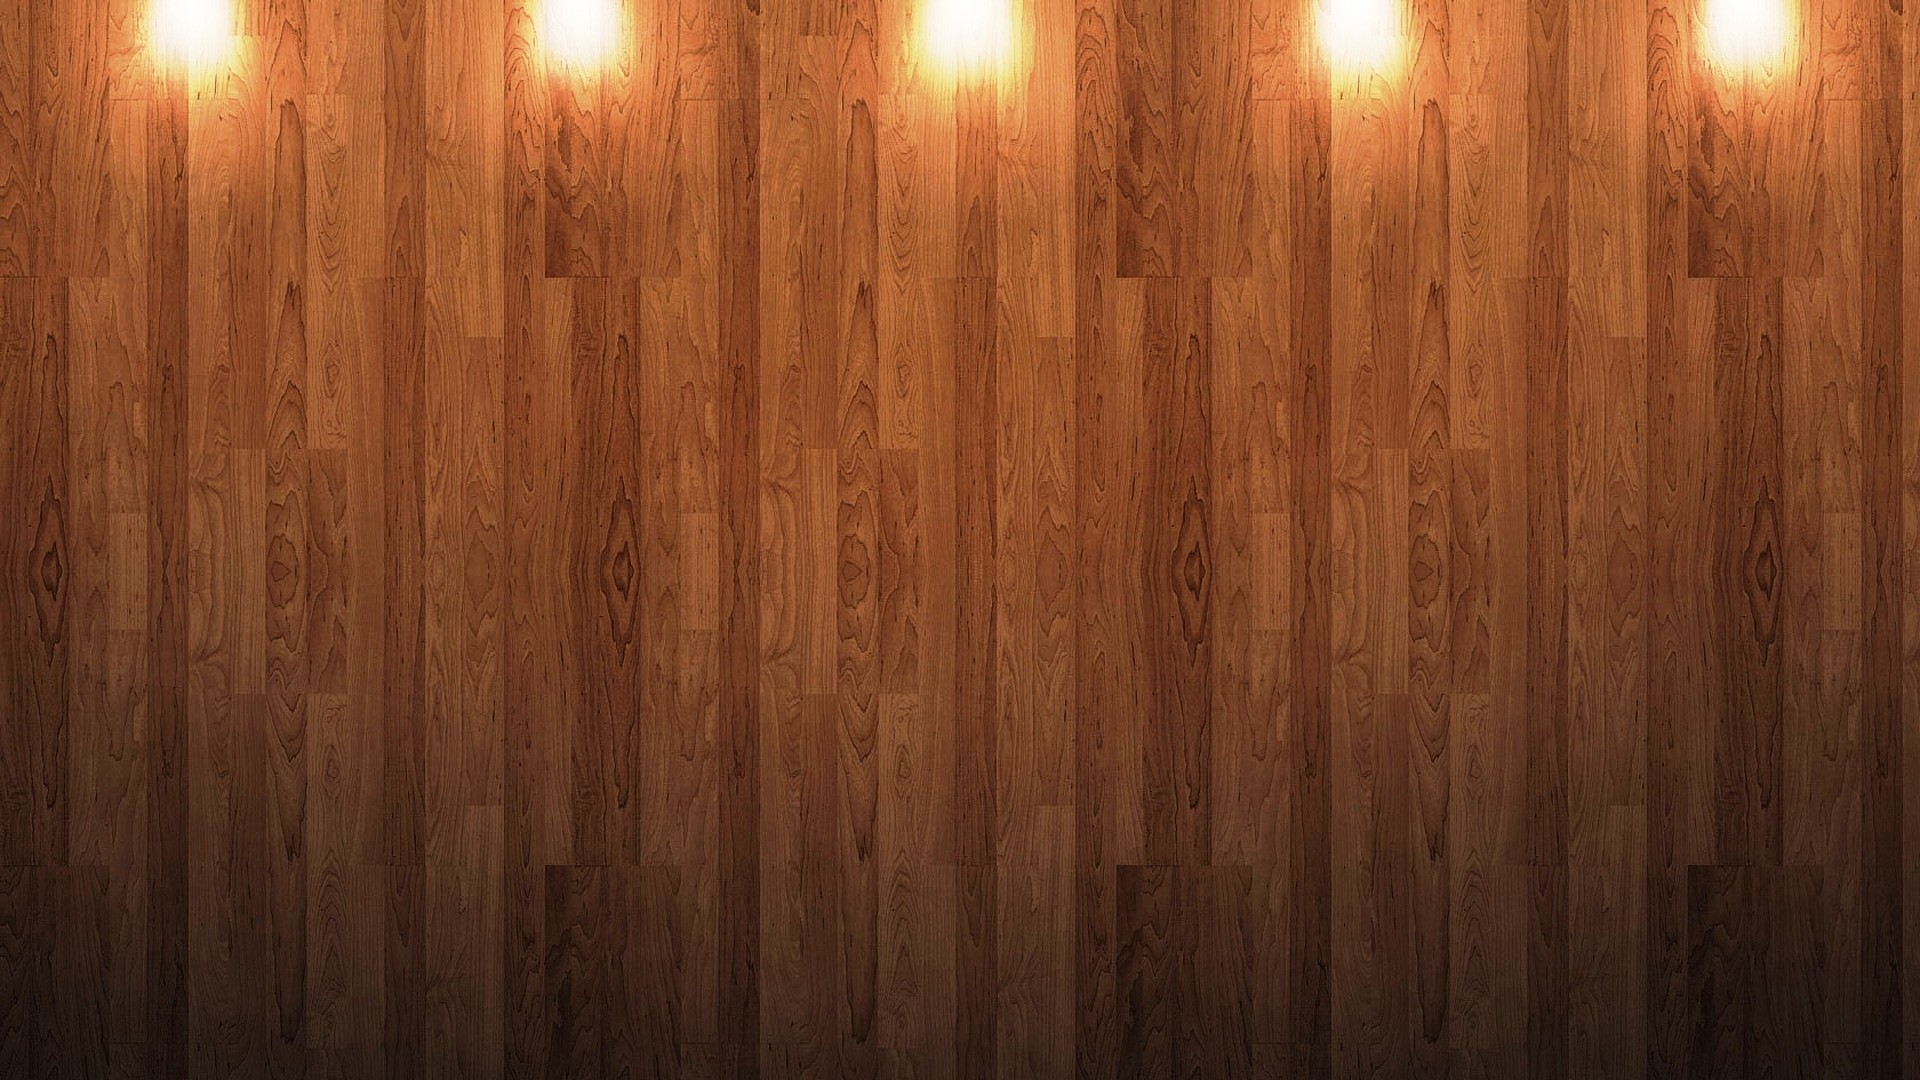 Wood Wallpaper 1080p (73+ images)